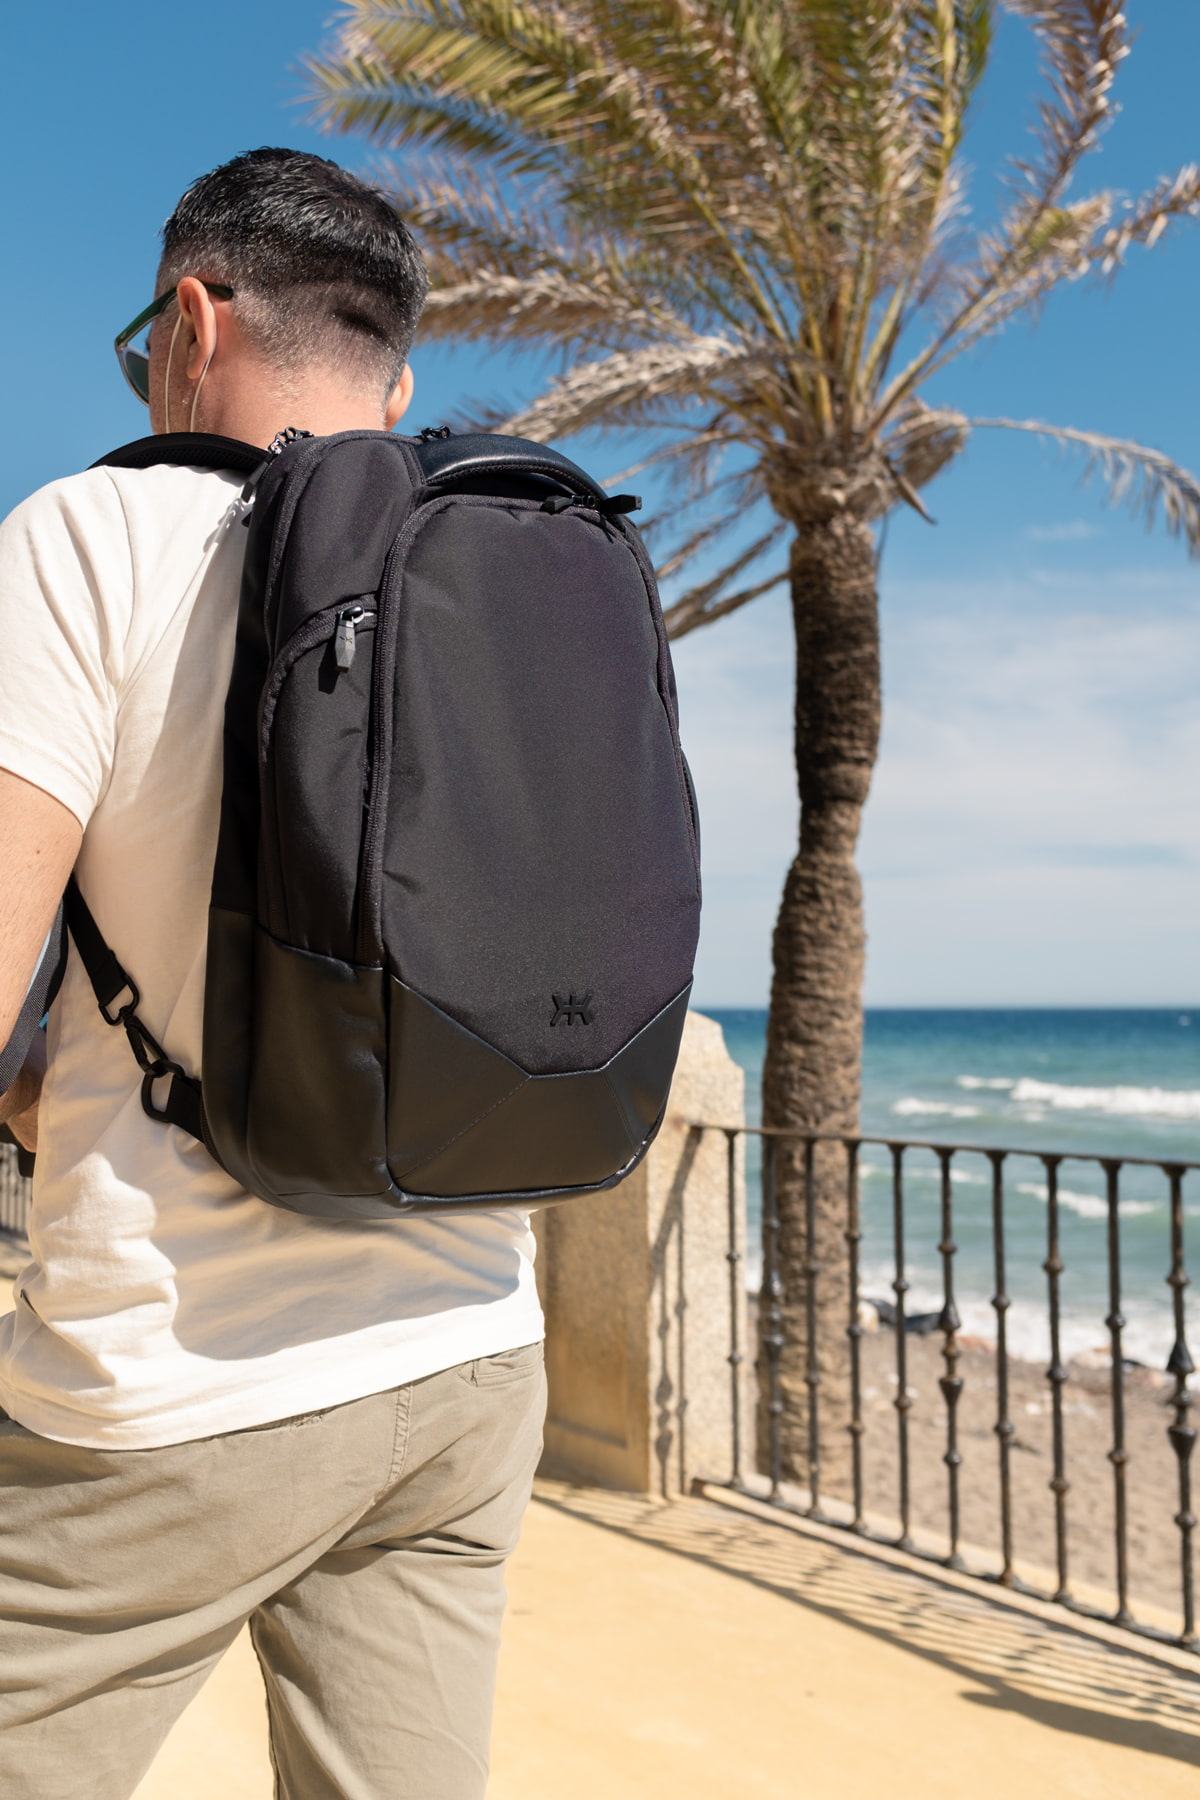 Expandable EDC backpack